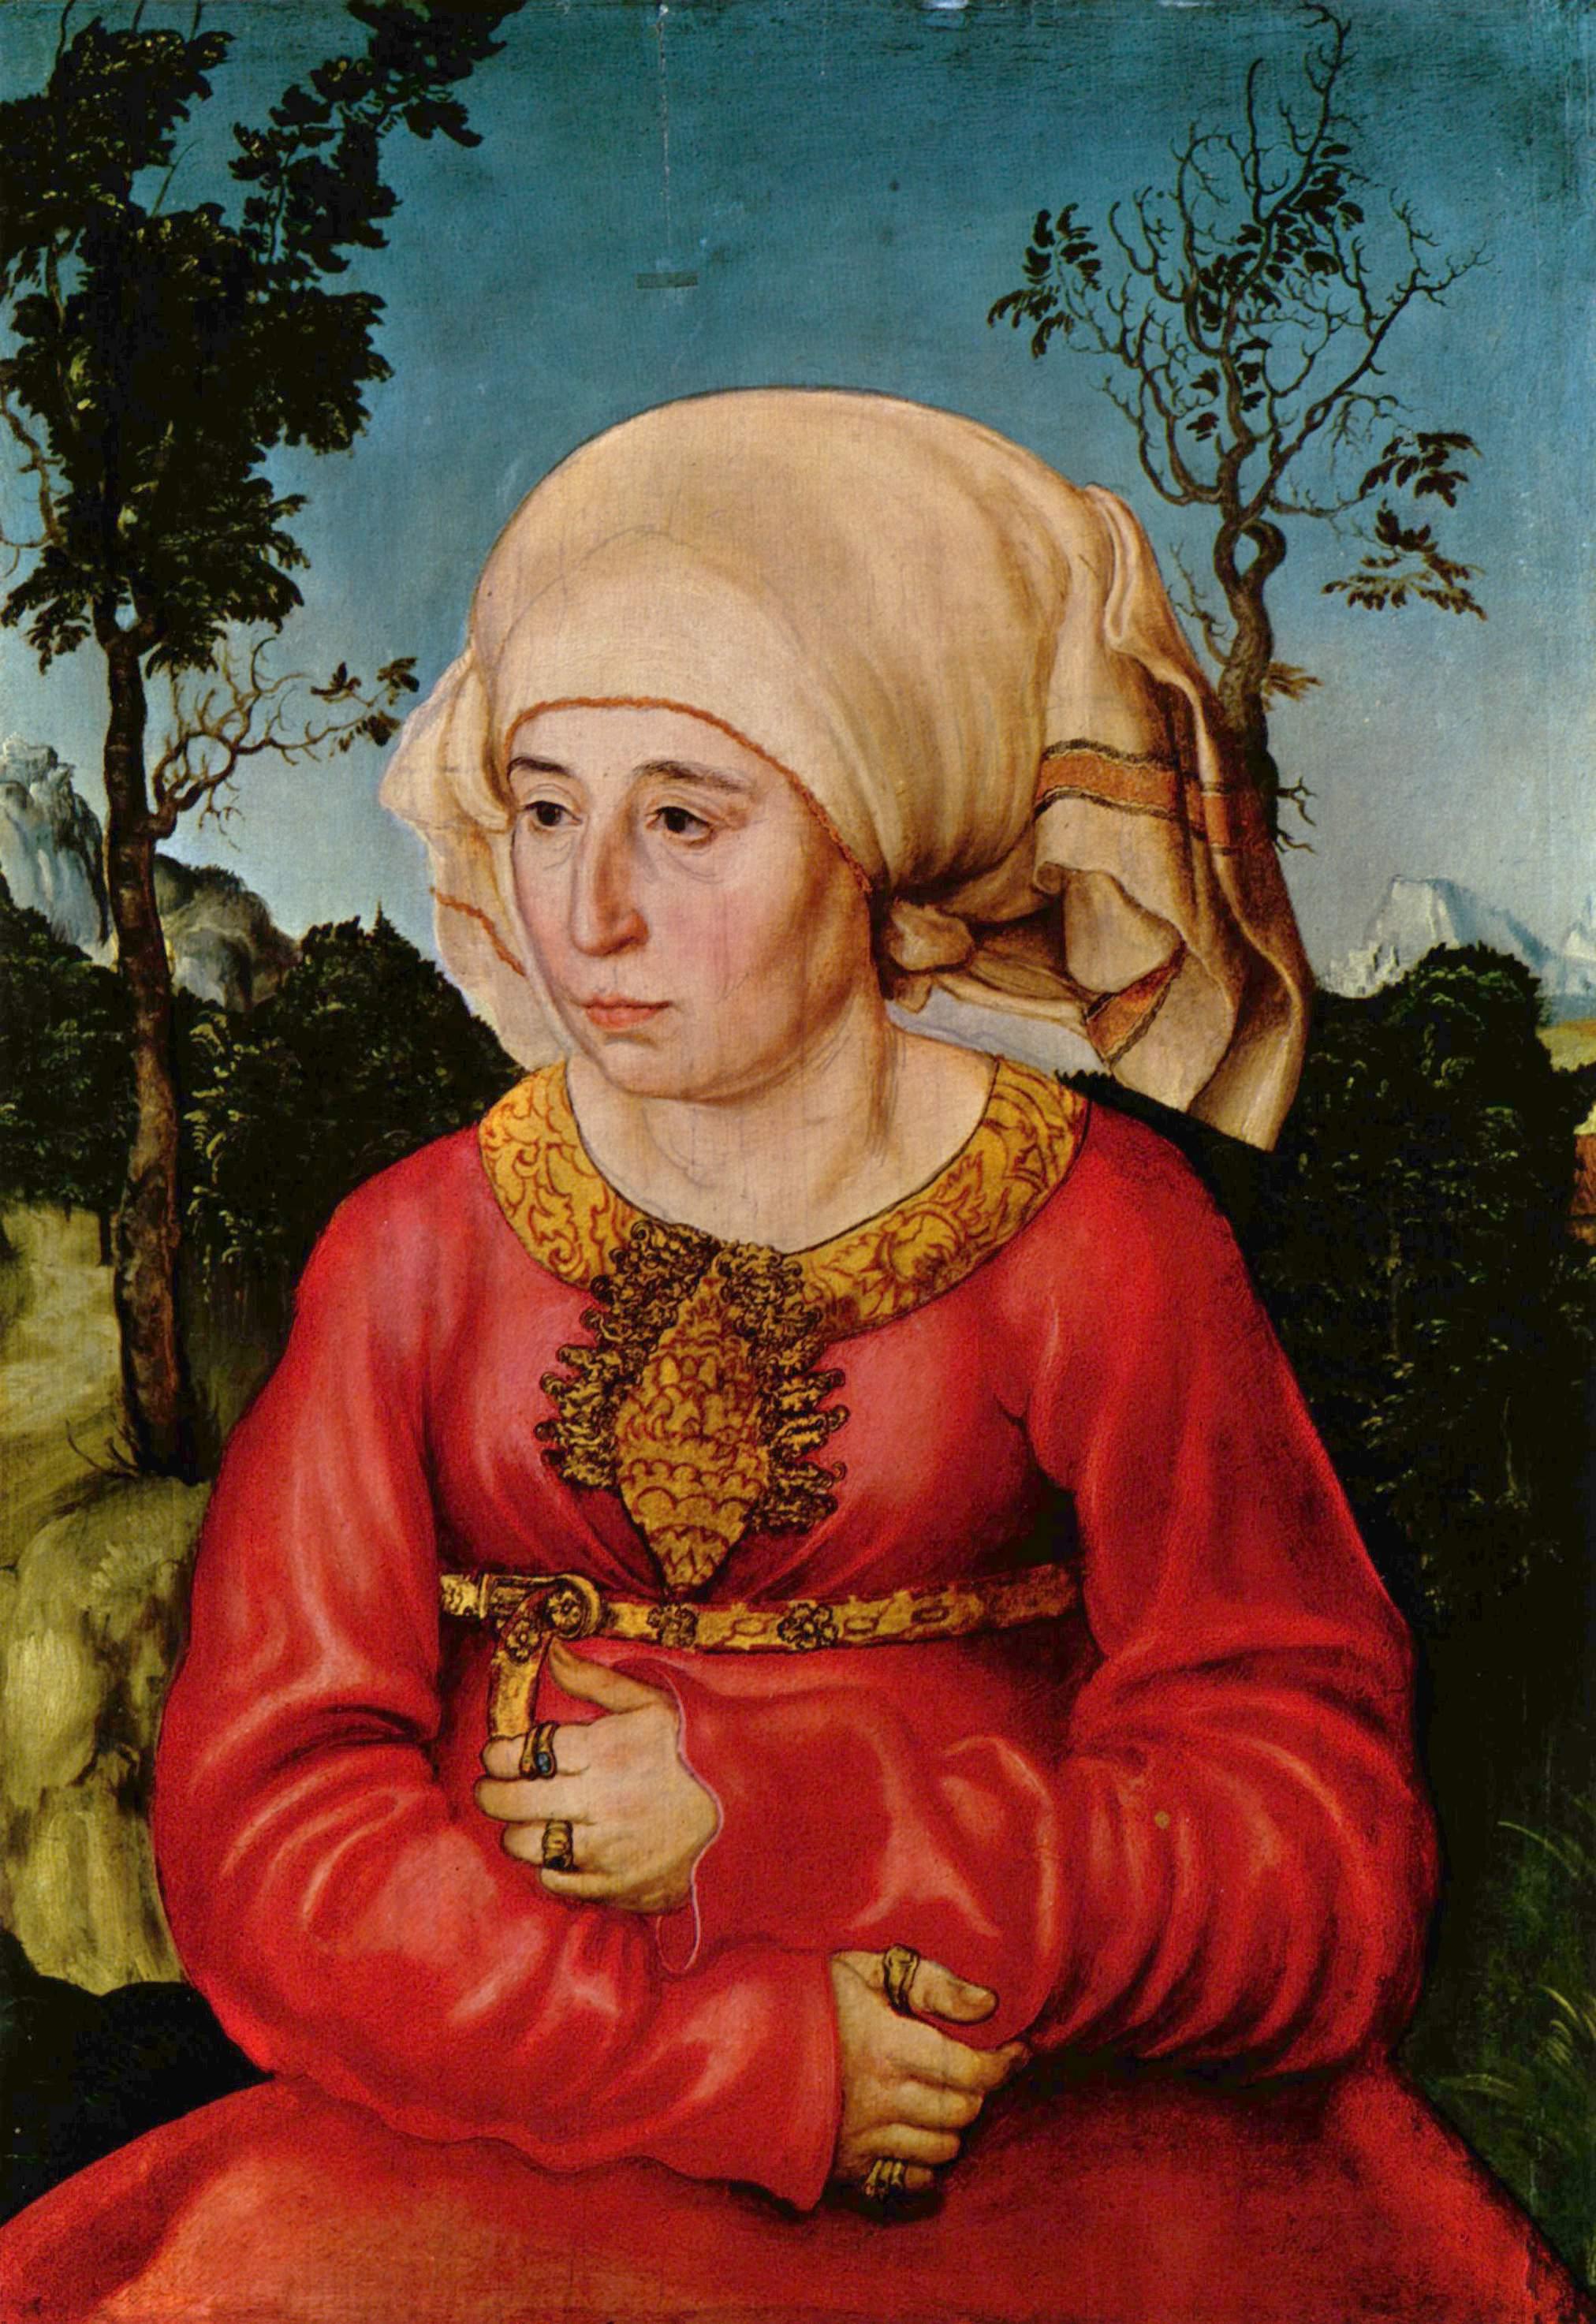 lucas-cranach-the-elder/wife-of-dr-johann-stephan-reuss